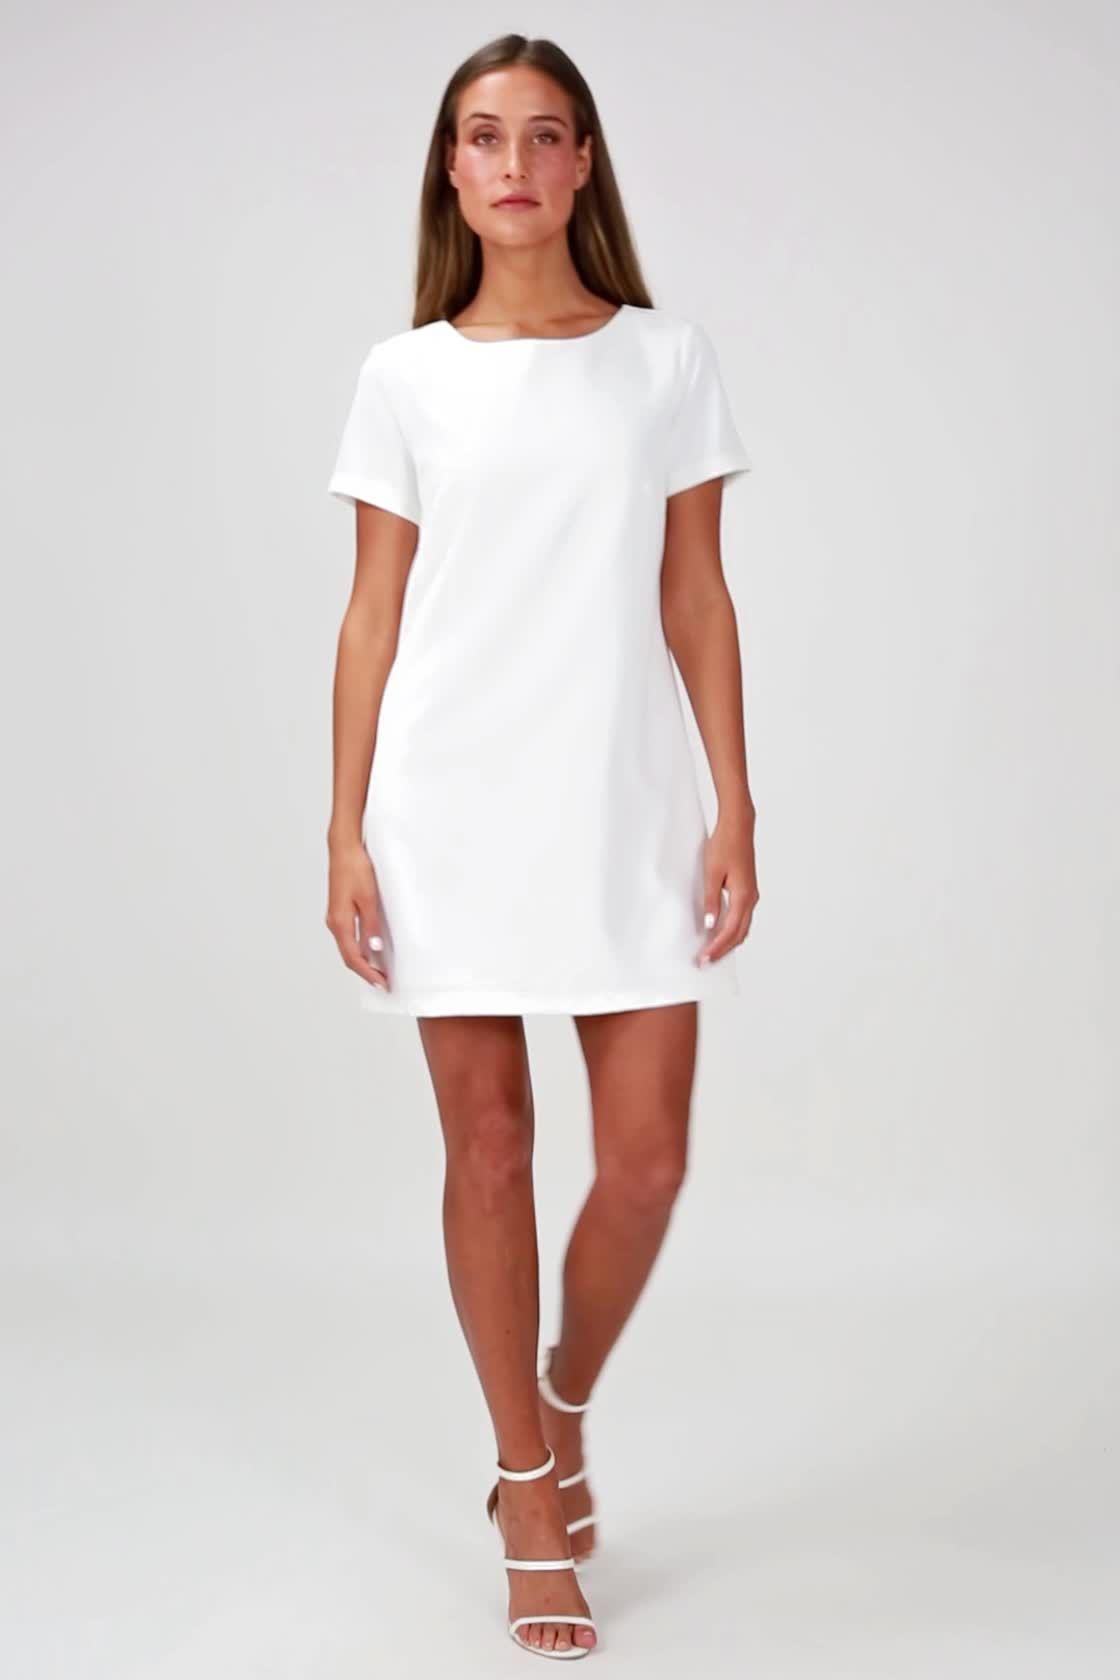 c11a3a40a0e7 Shift and Shout Ivory Shift Dress in 2019 | white dress | White ...